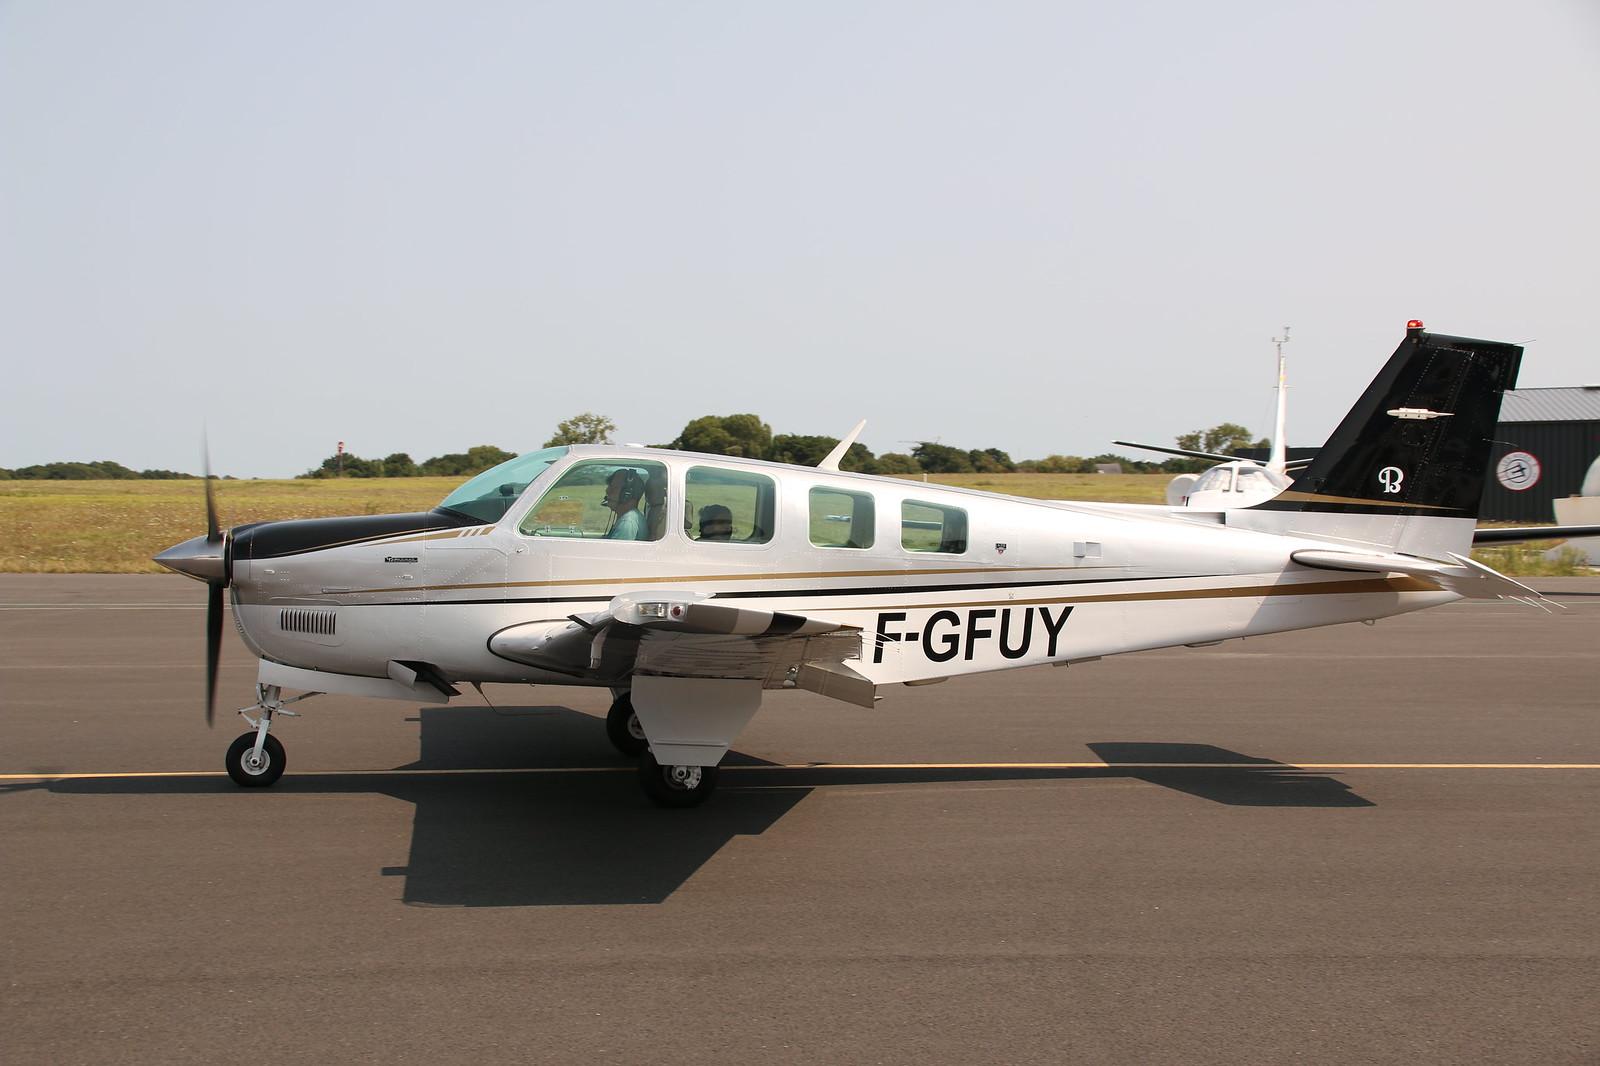 Aérodrome de La Baule Escoublac - Page 4 29180467177_cf54edb1fa_h